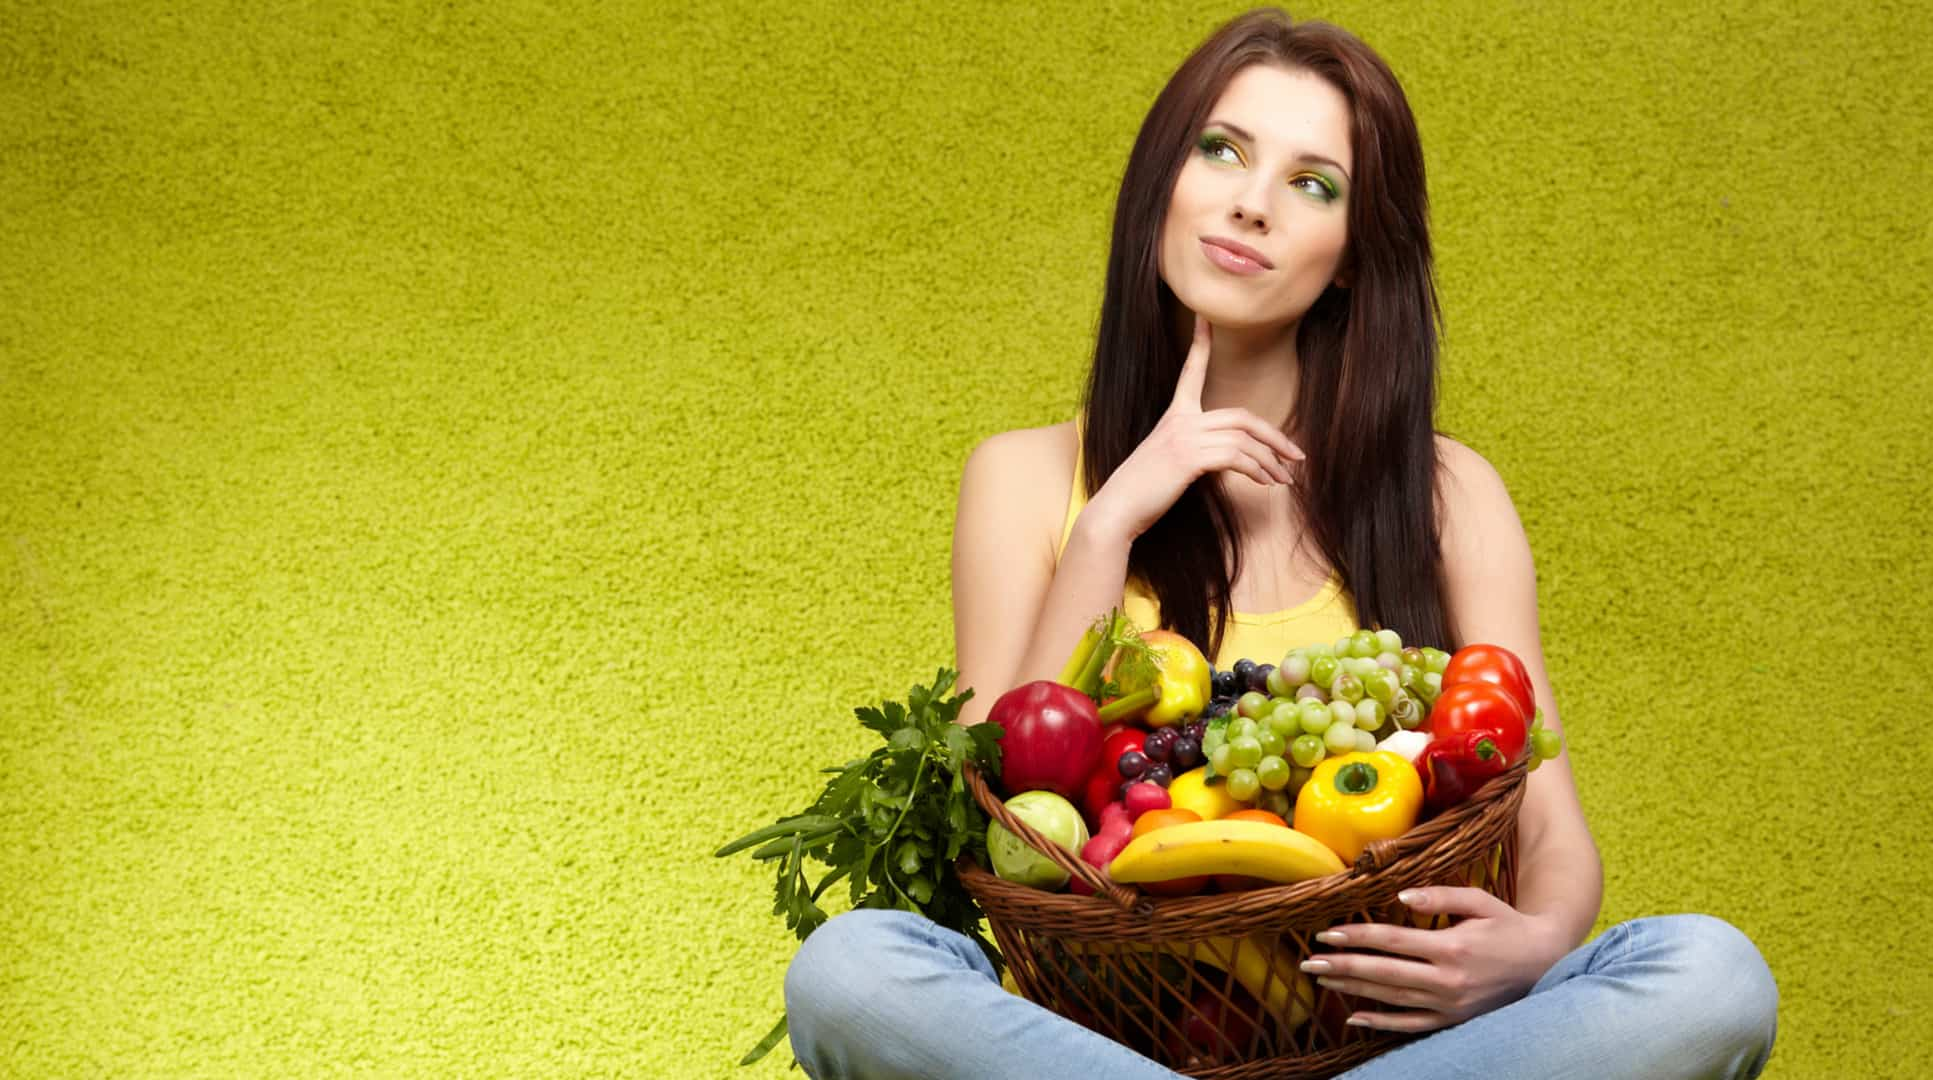 woman holding veggies